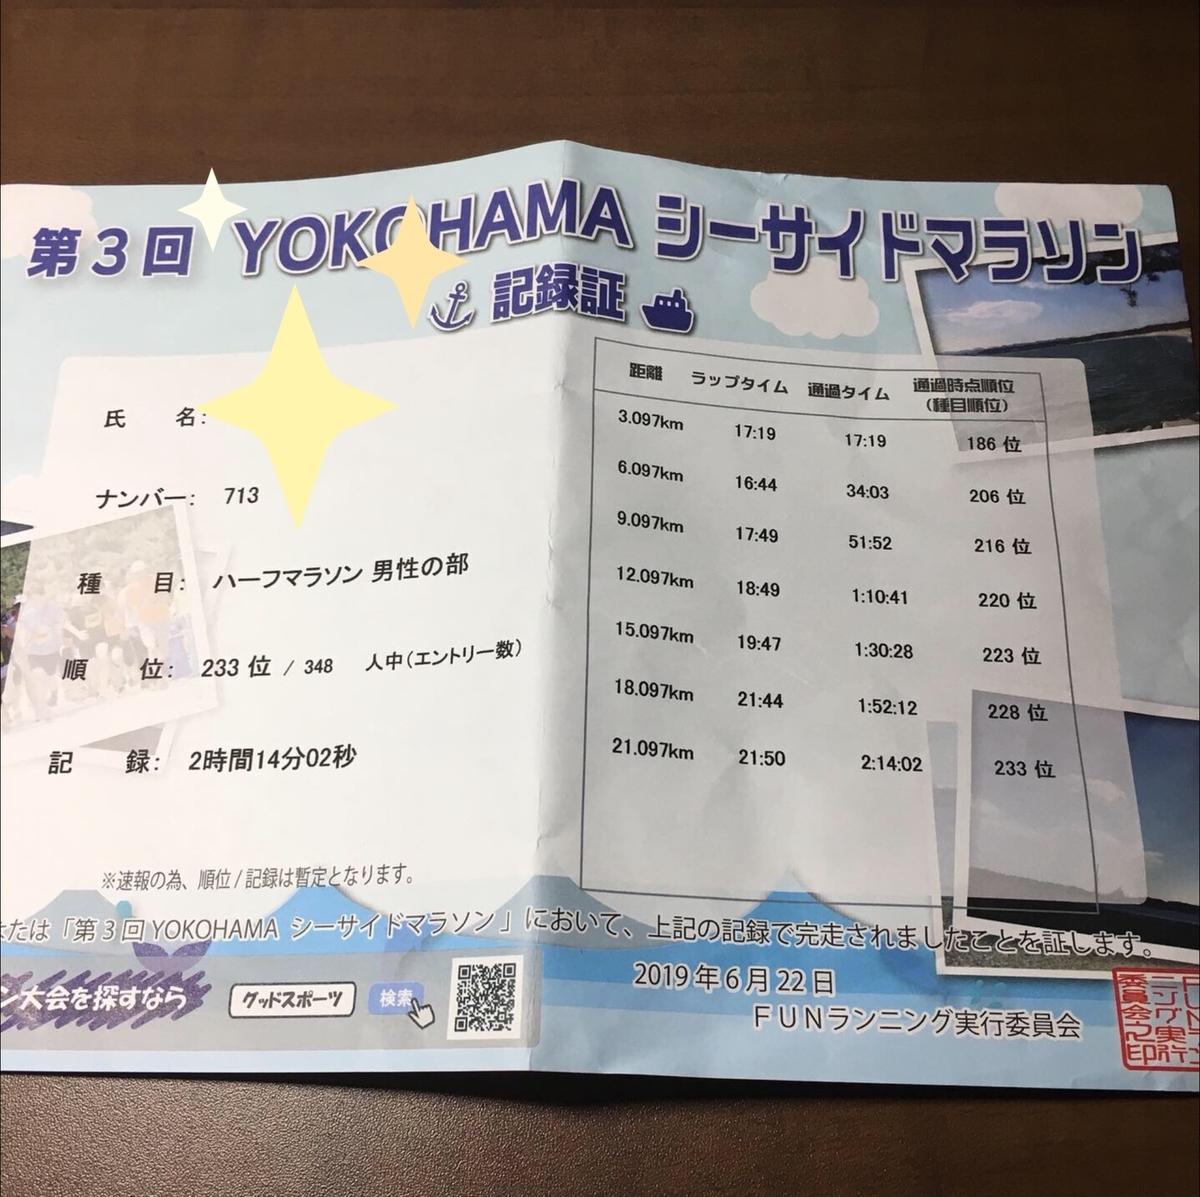 f:id:yokoyokko:20190623135558j:plain